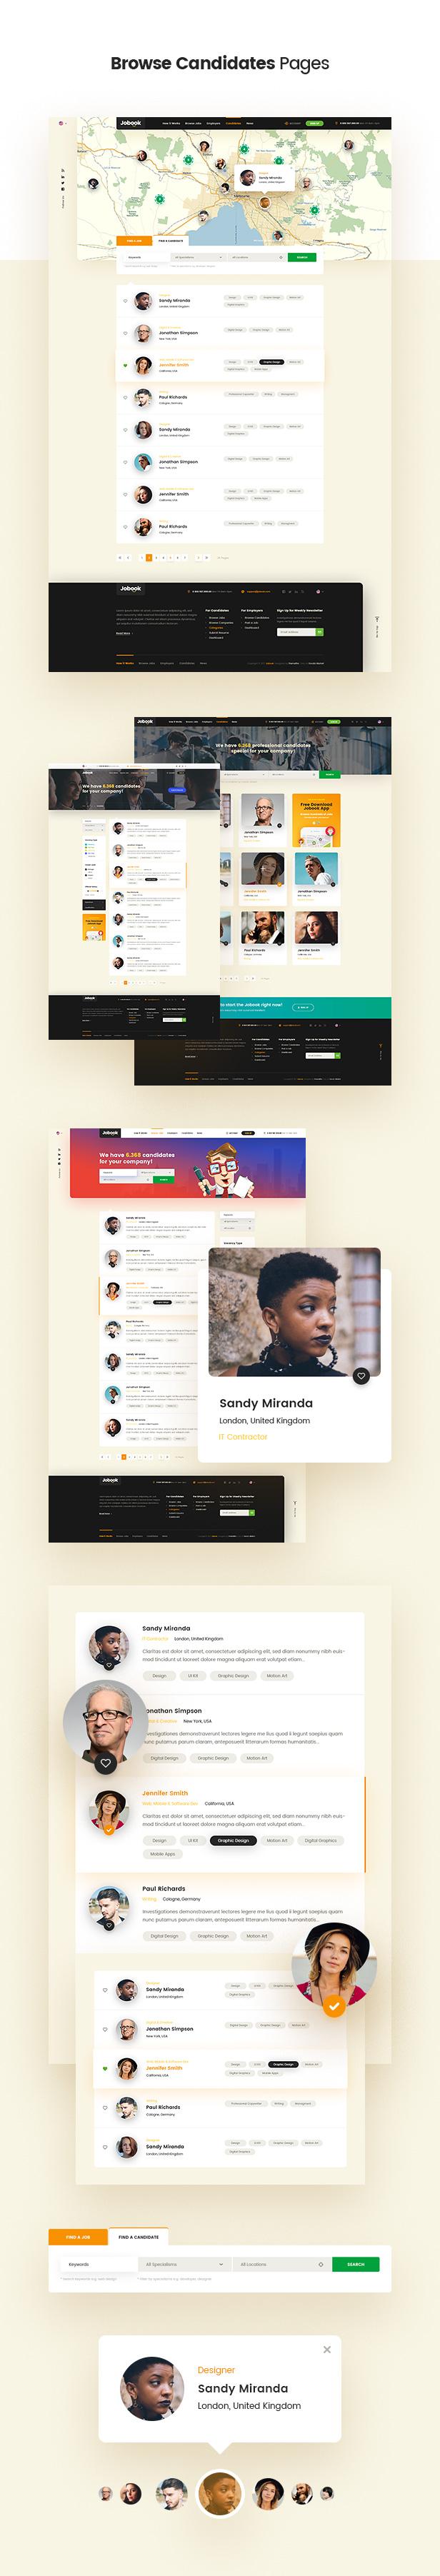 Jobook - A Unique Job Board Website PSD Template - 5